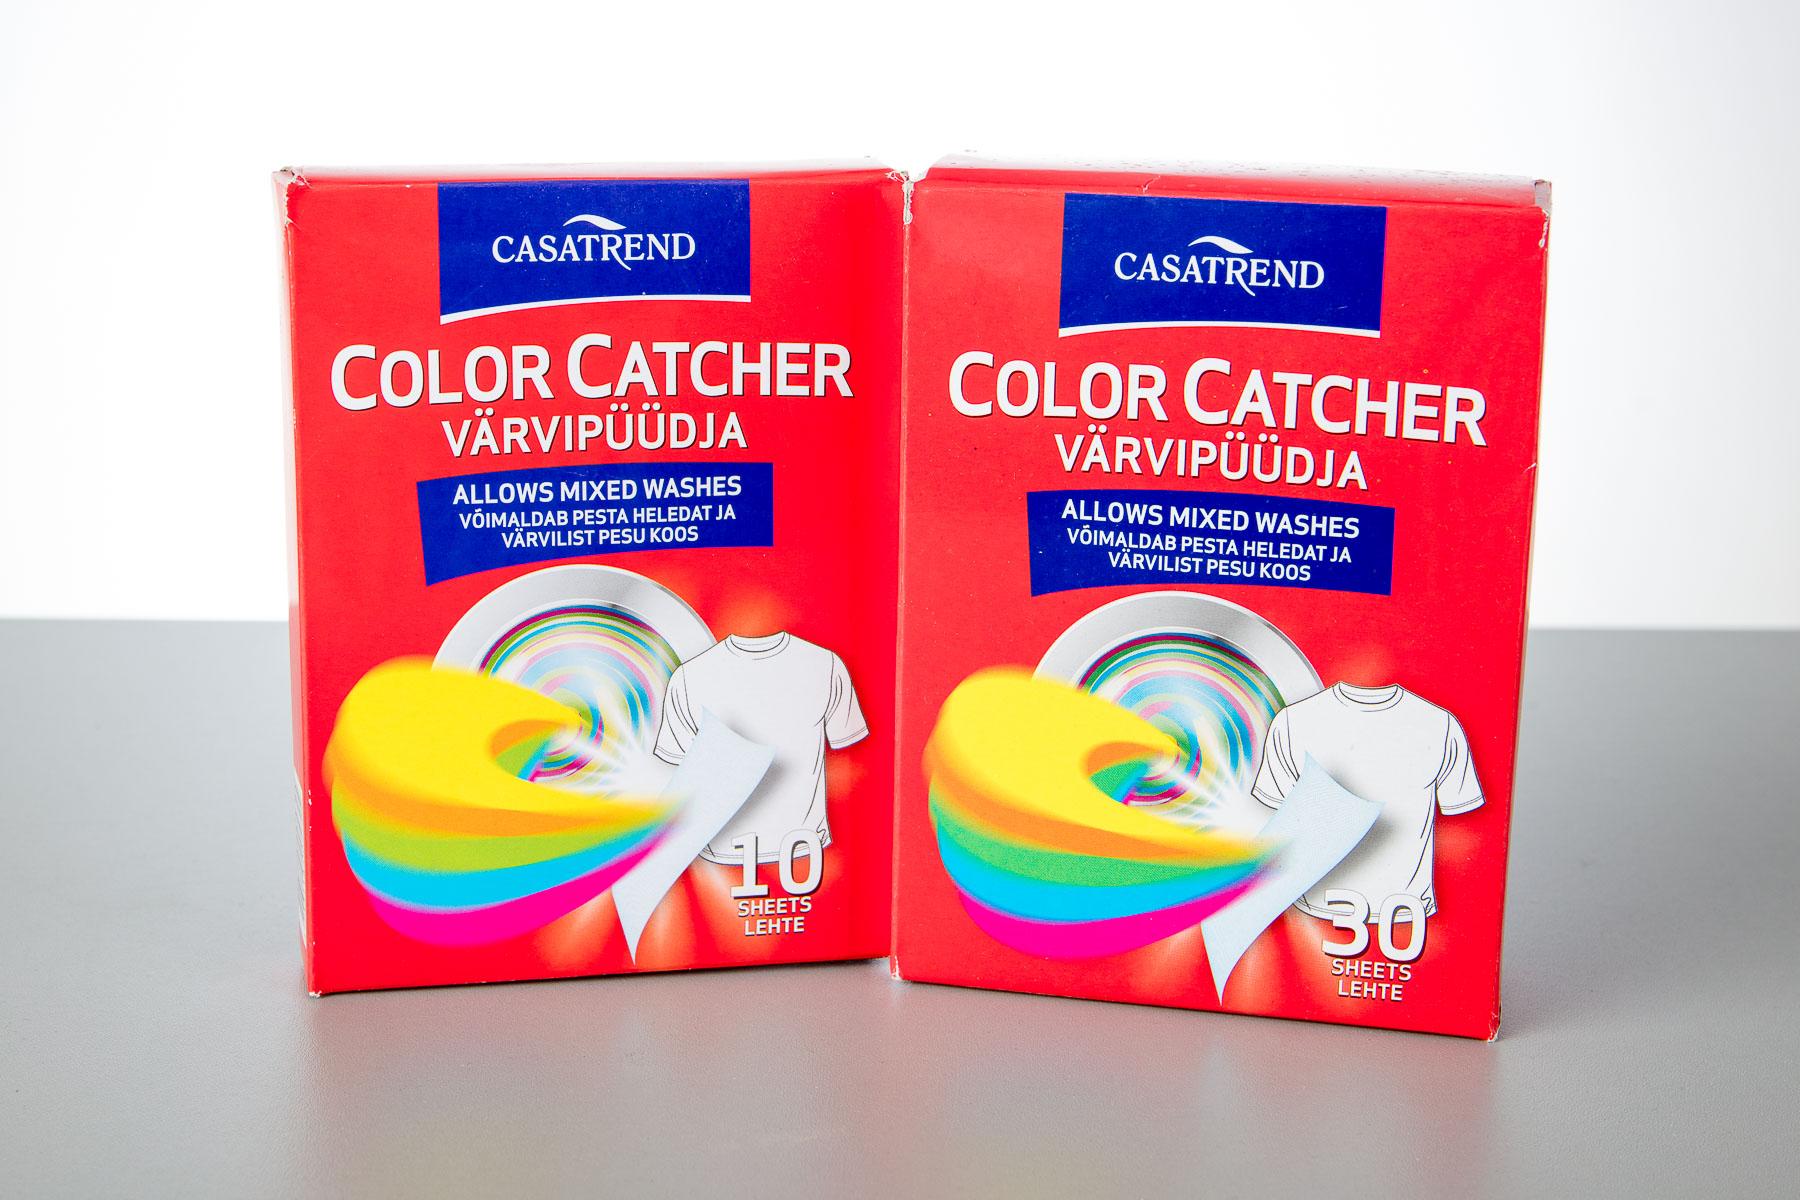 Casatrend Color Catcer - Ursus OÜ